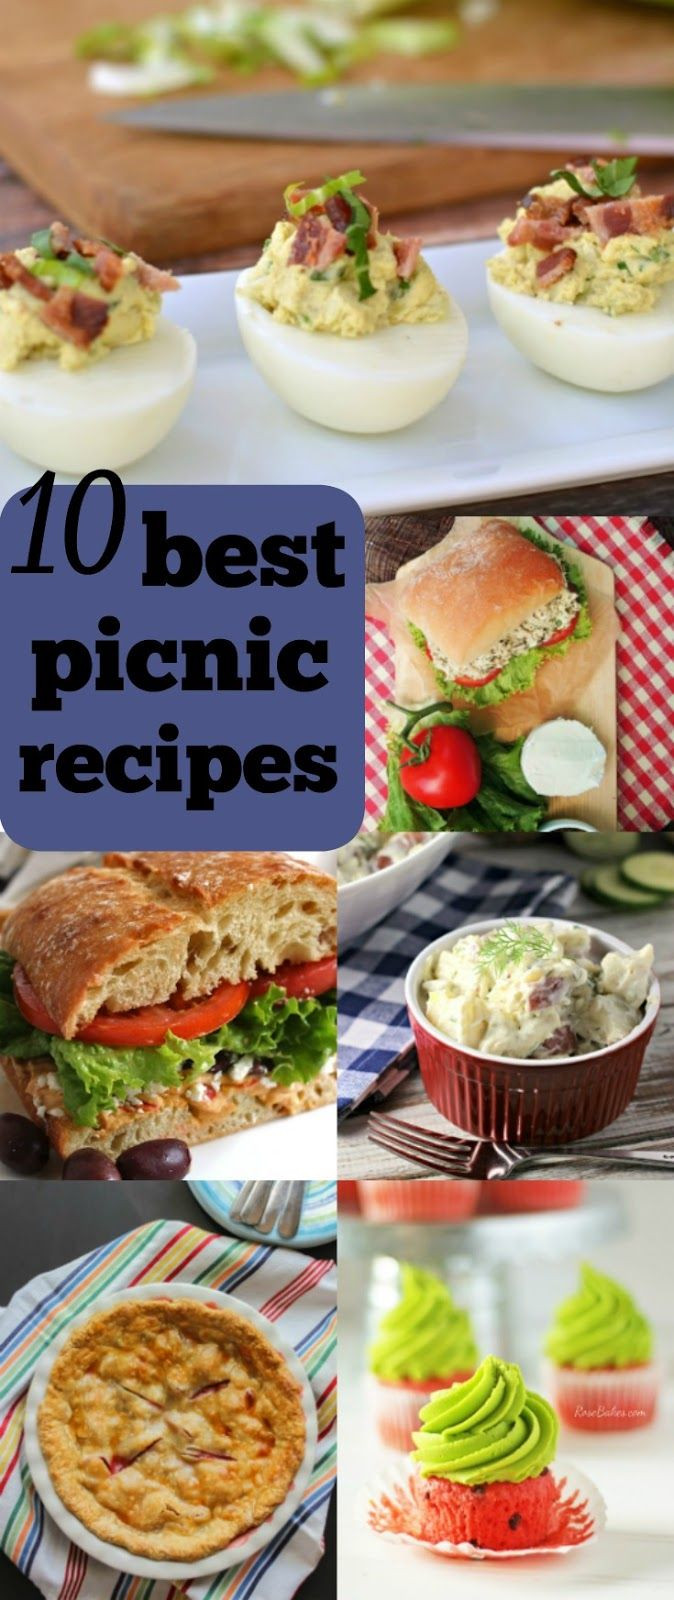 Healthy Potluck Desserts  The 25 best Picnic recipes ideas on Pinterest